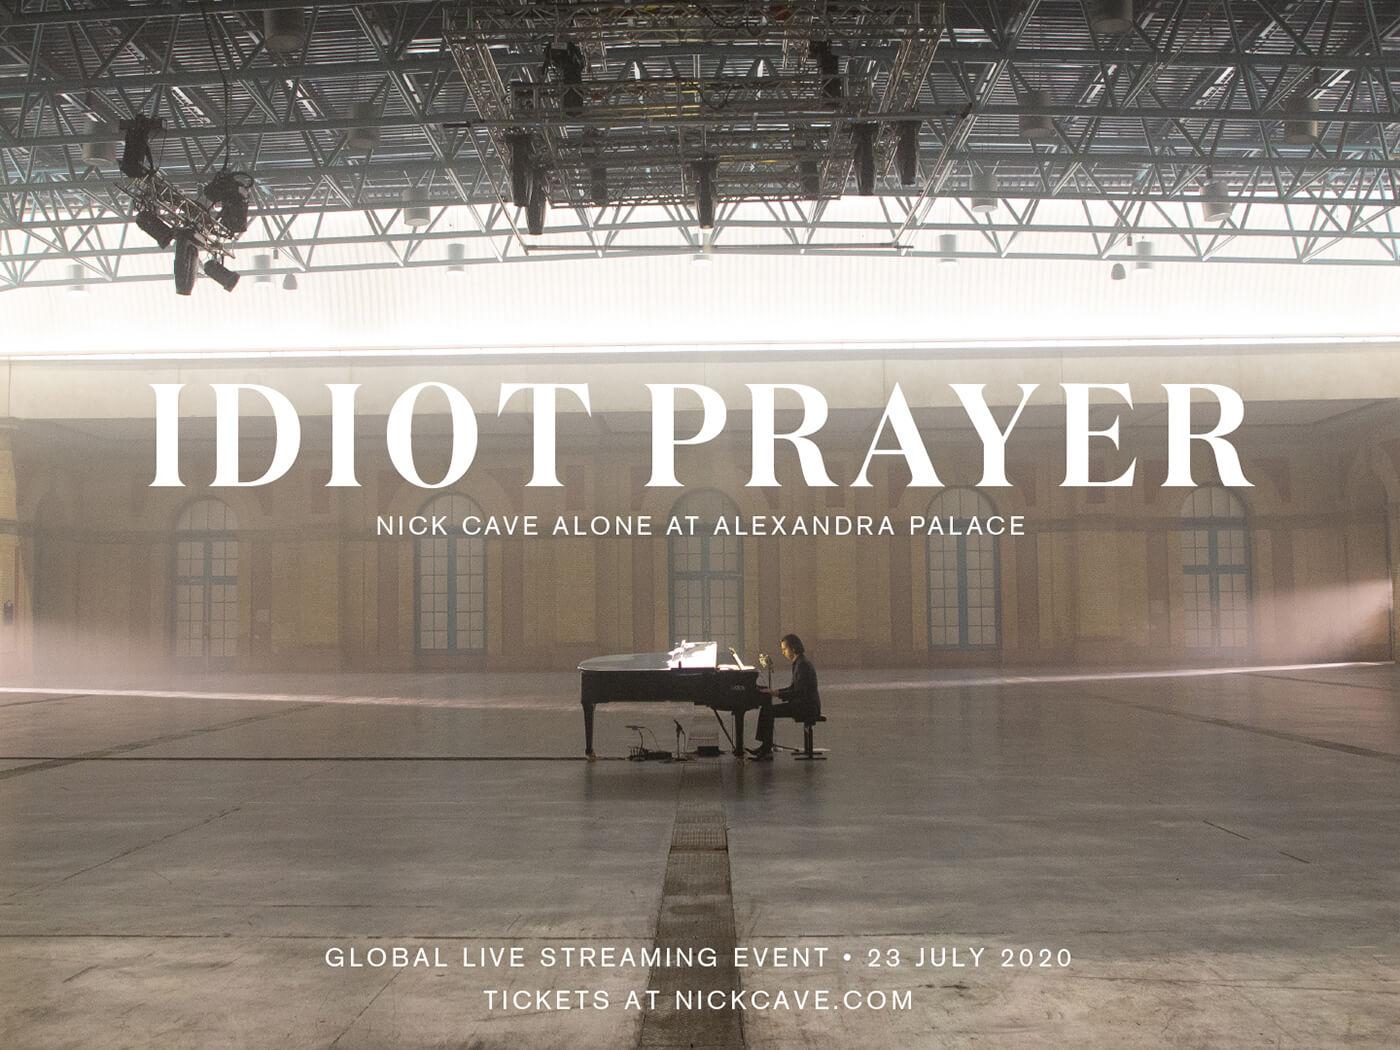 Nick Cave announces livestream of solo piano performance